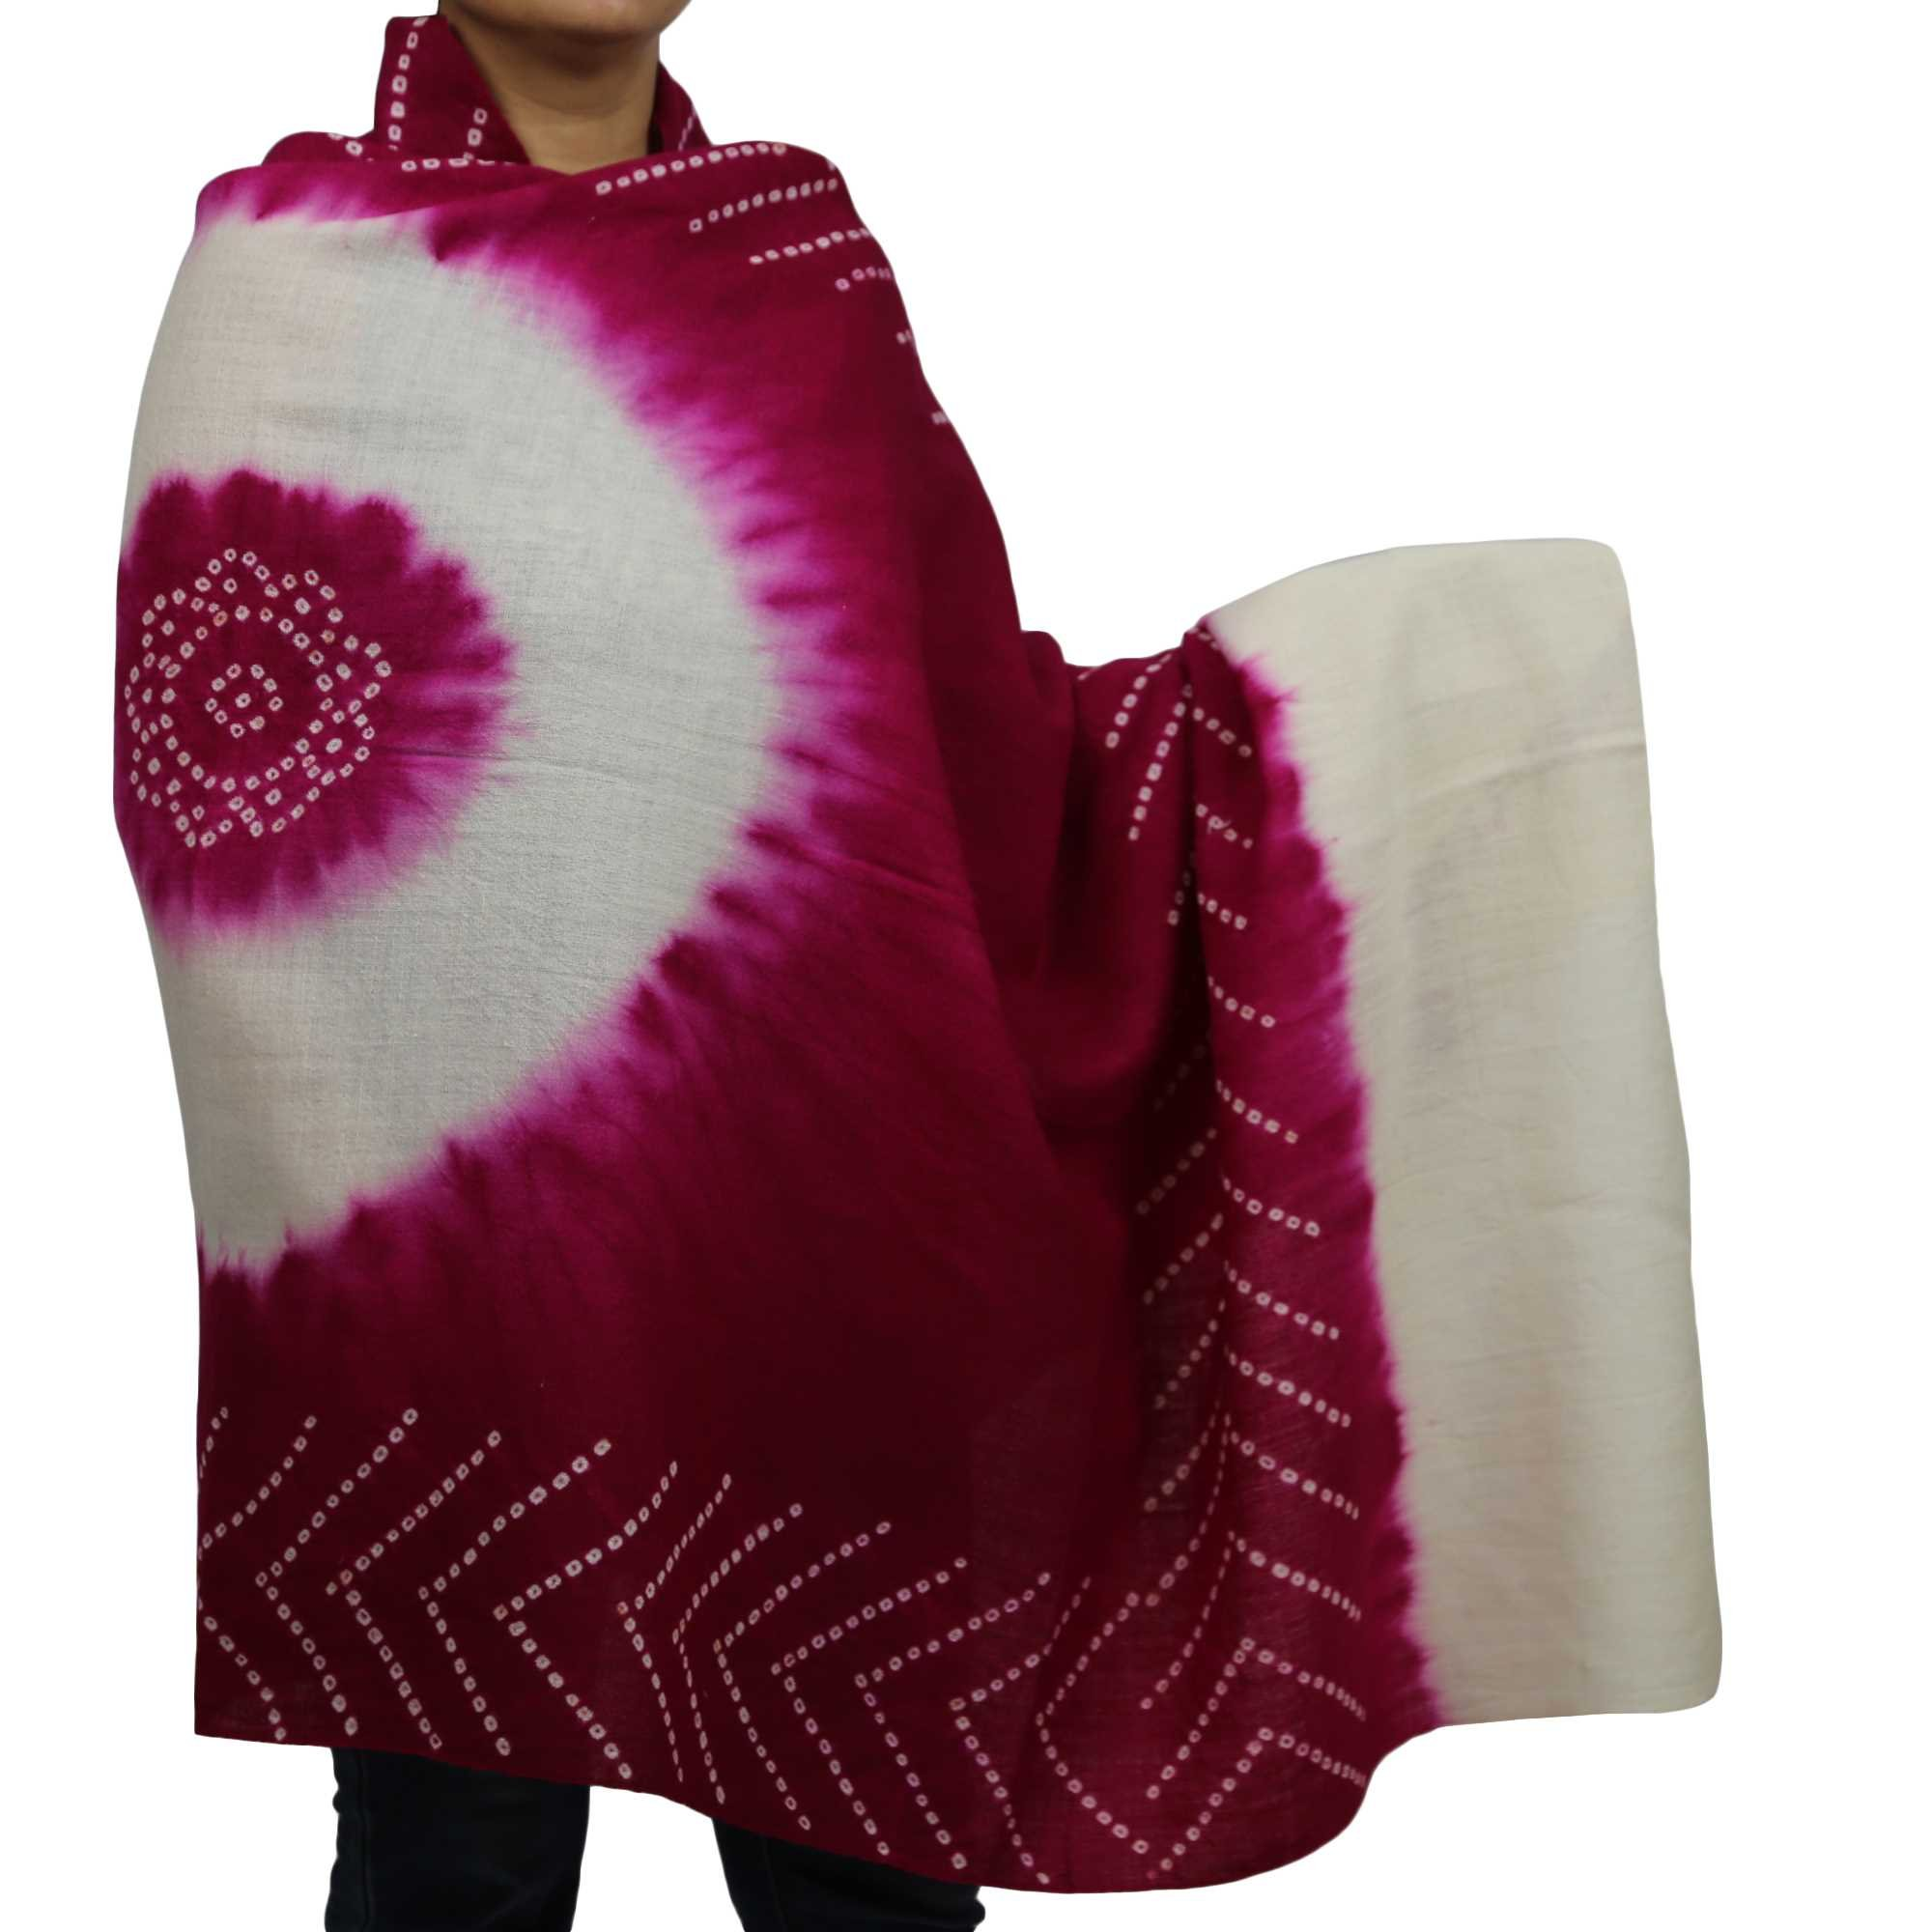 Red-Violet Cream Women'S Accessory Indian Woolen Shawl Tie-Dye Handmade 36 X 80